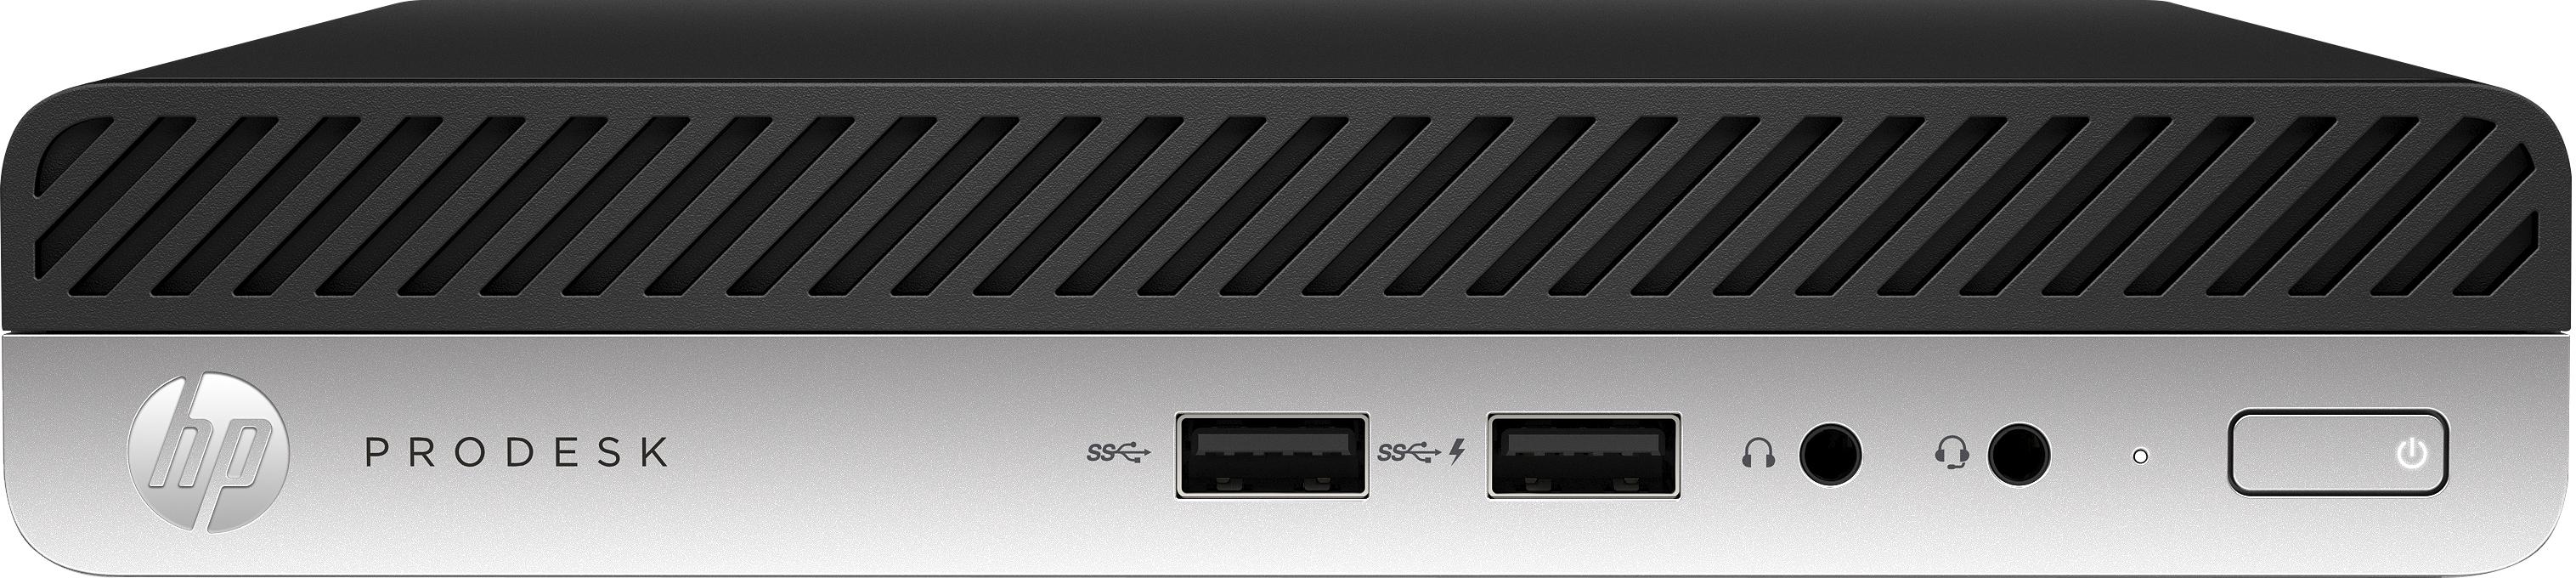 HP ProDesk 400 G5 - Komplettsystem - Core i5 2,2 GHz - RAM: 8 GB DDR4 - HDD: 256 GB NVMe, Serial ATA - UHD Graphics 600